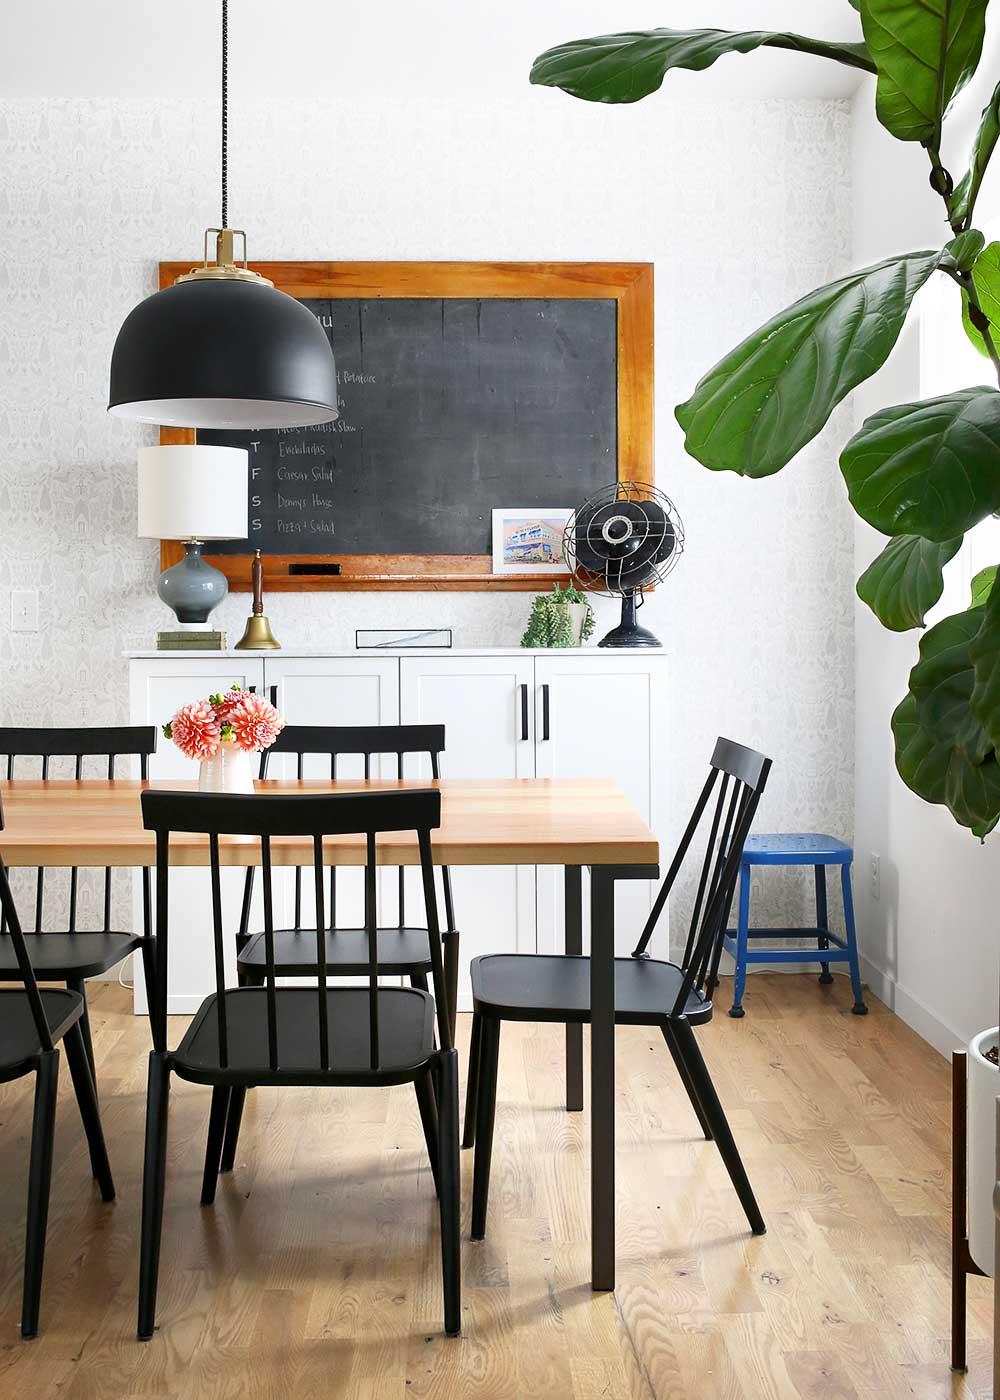 insdispensable minimaliste salle a manger decoration